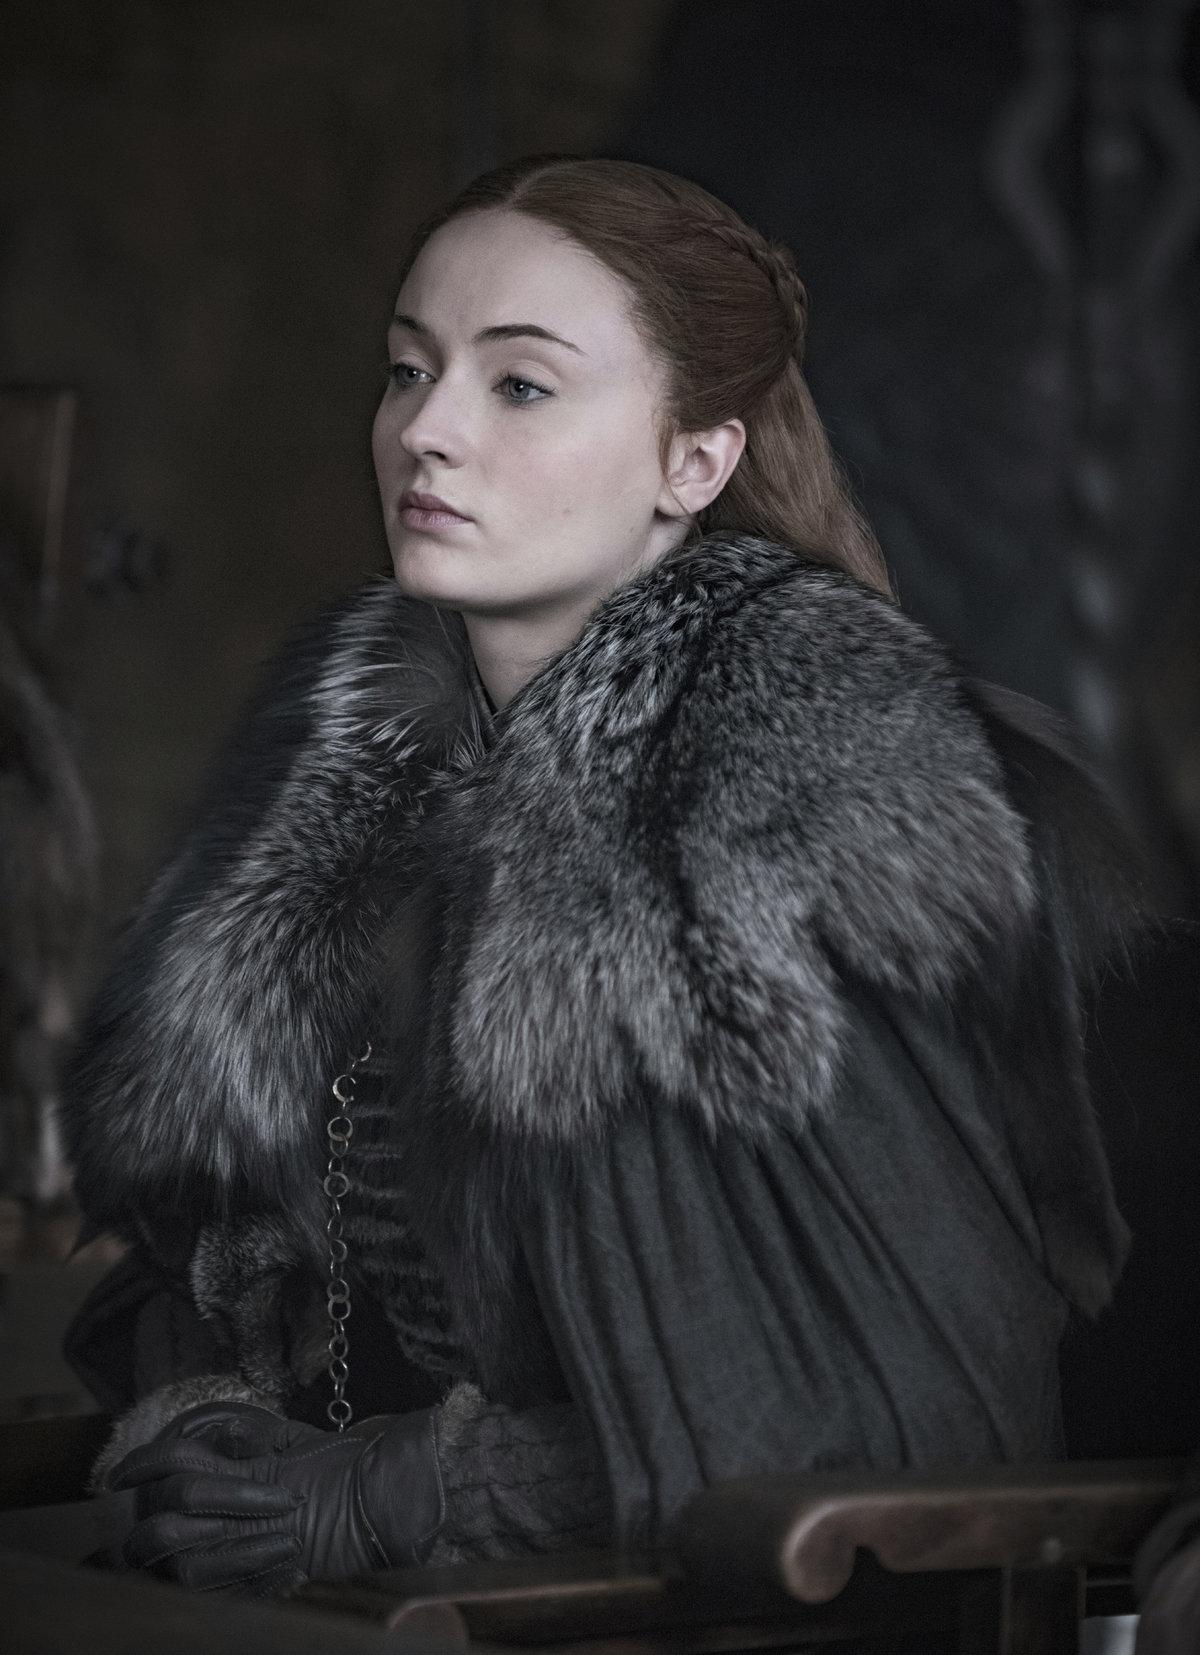 Sophie Turner v roli Sansy Stark